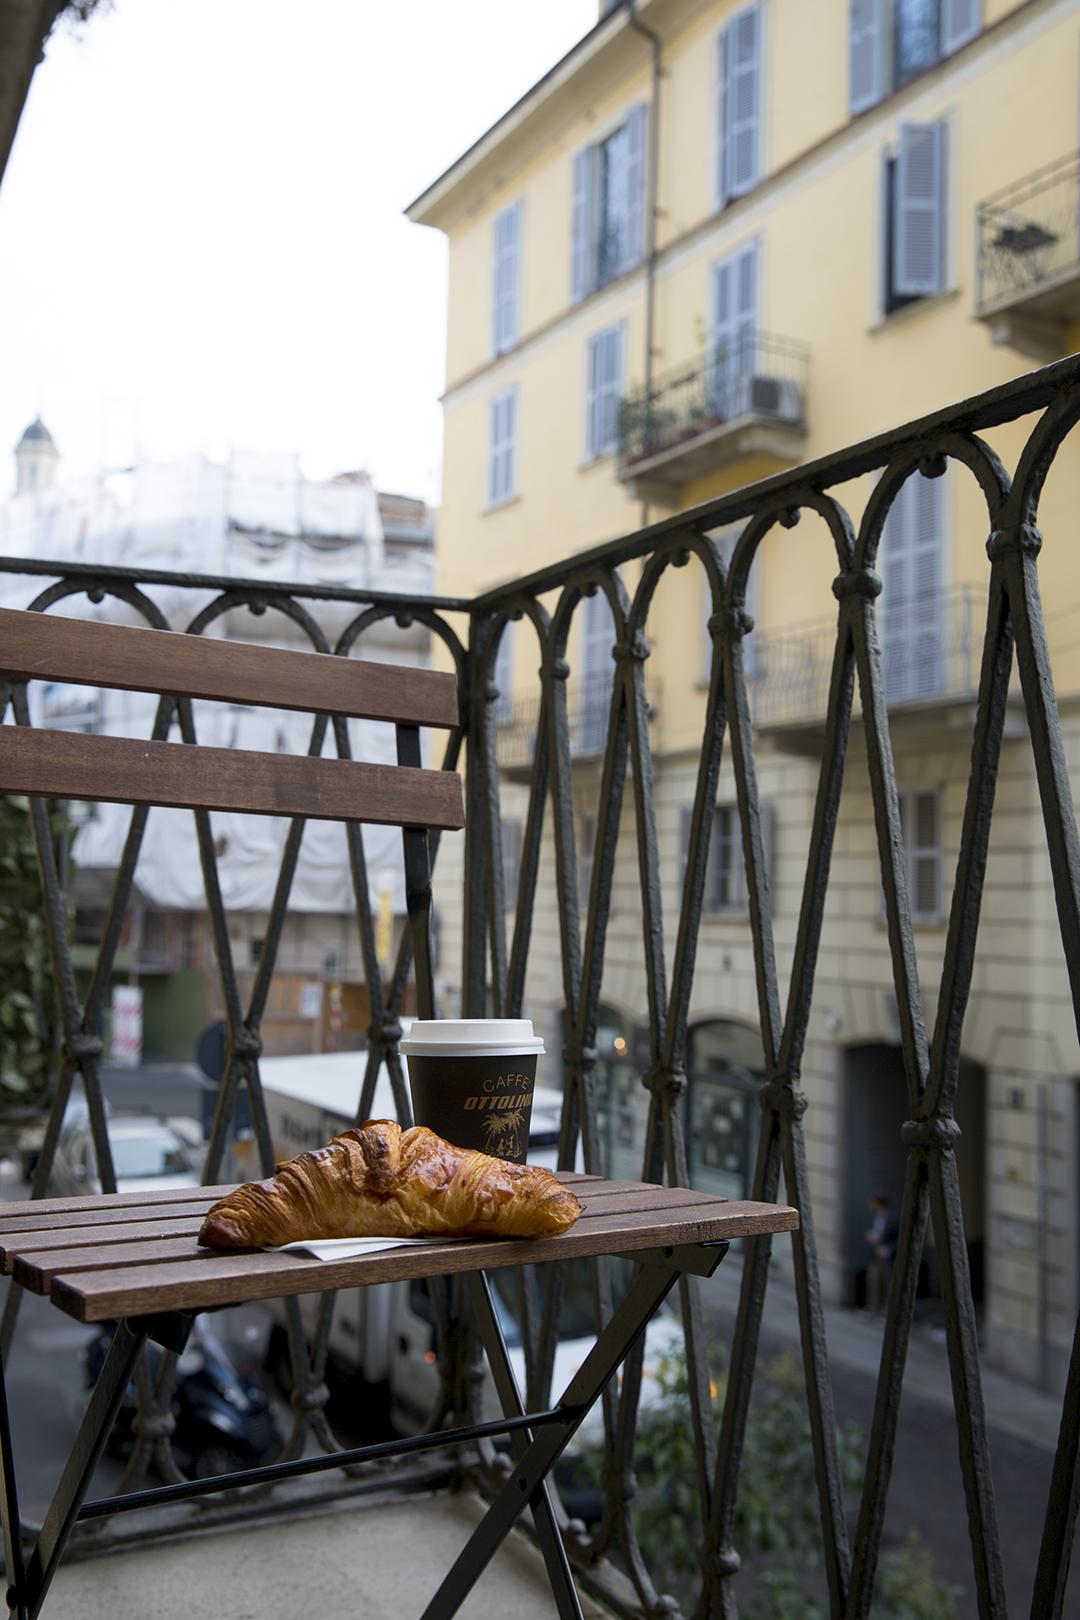 Coffee-croissant.jpg